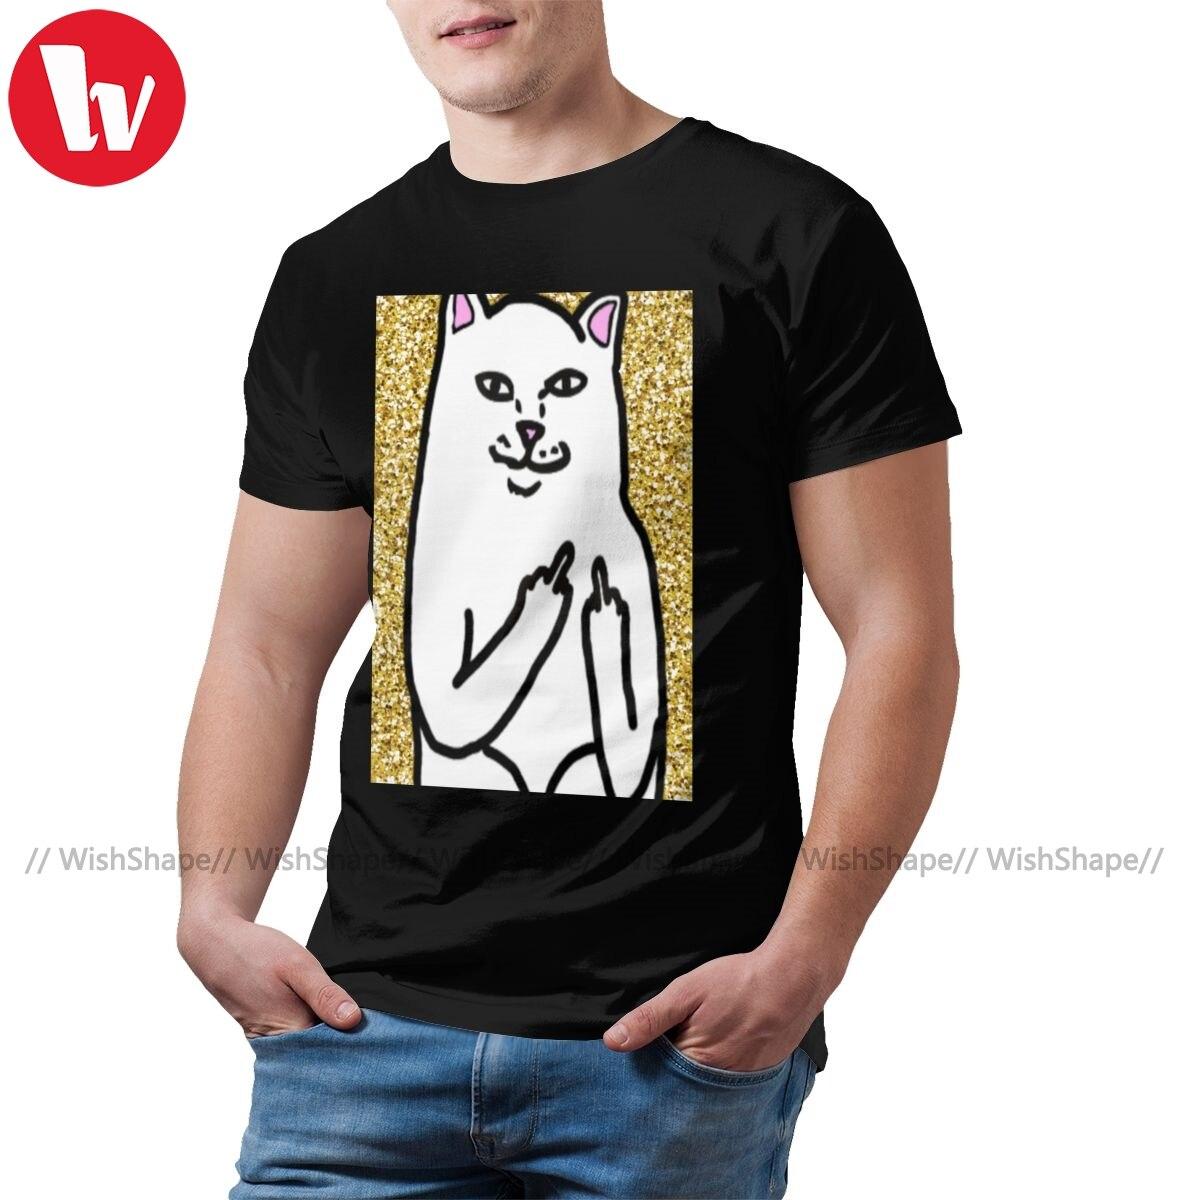 Herr Nermal T Hemd NERMAL Lange T-Shirt 4xl Kurzen Ärmeln T Hemd Baumwolle Grafik Herren Sommer Genial T-shirt